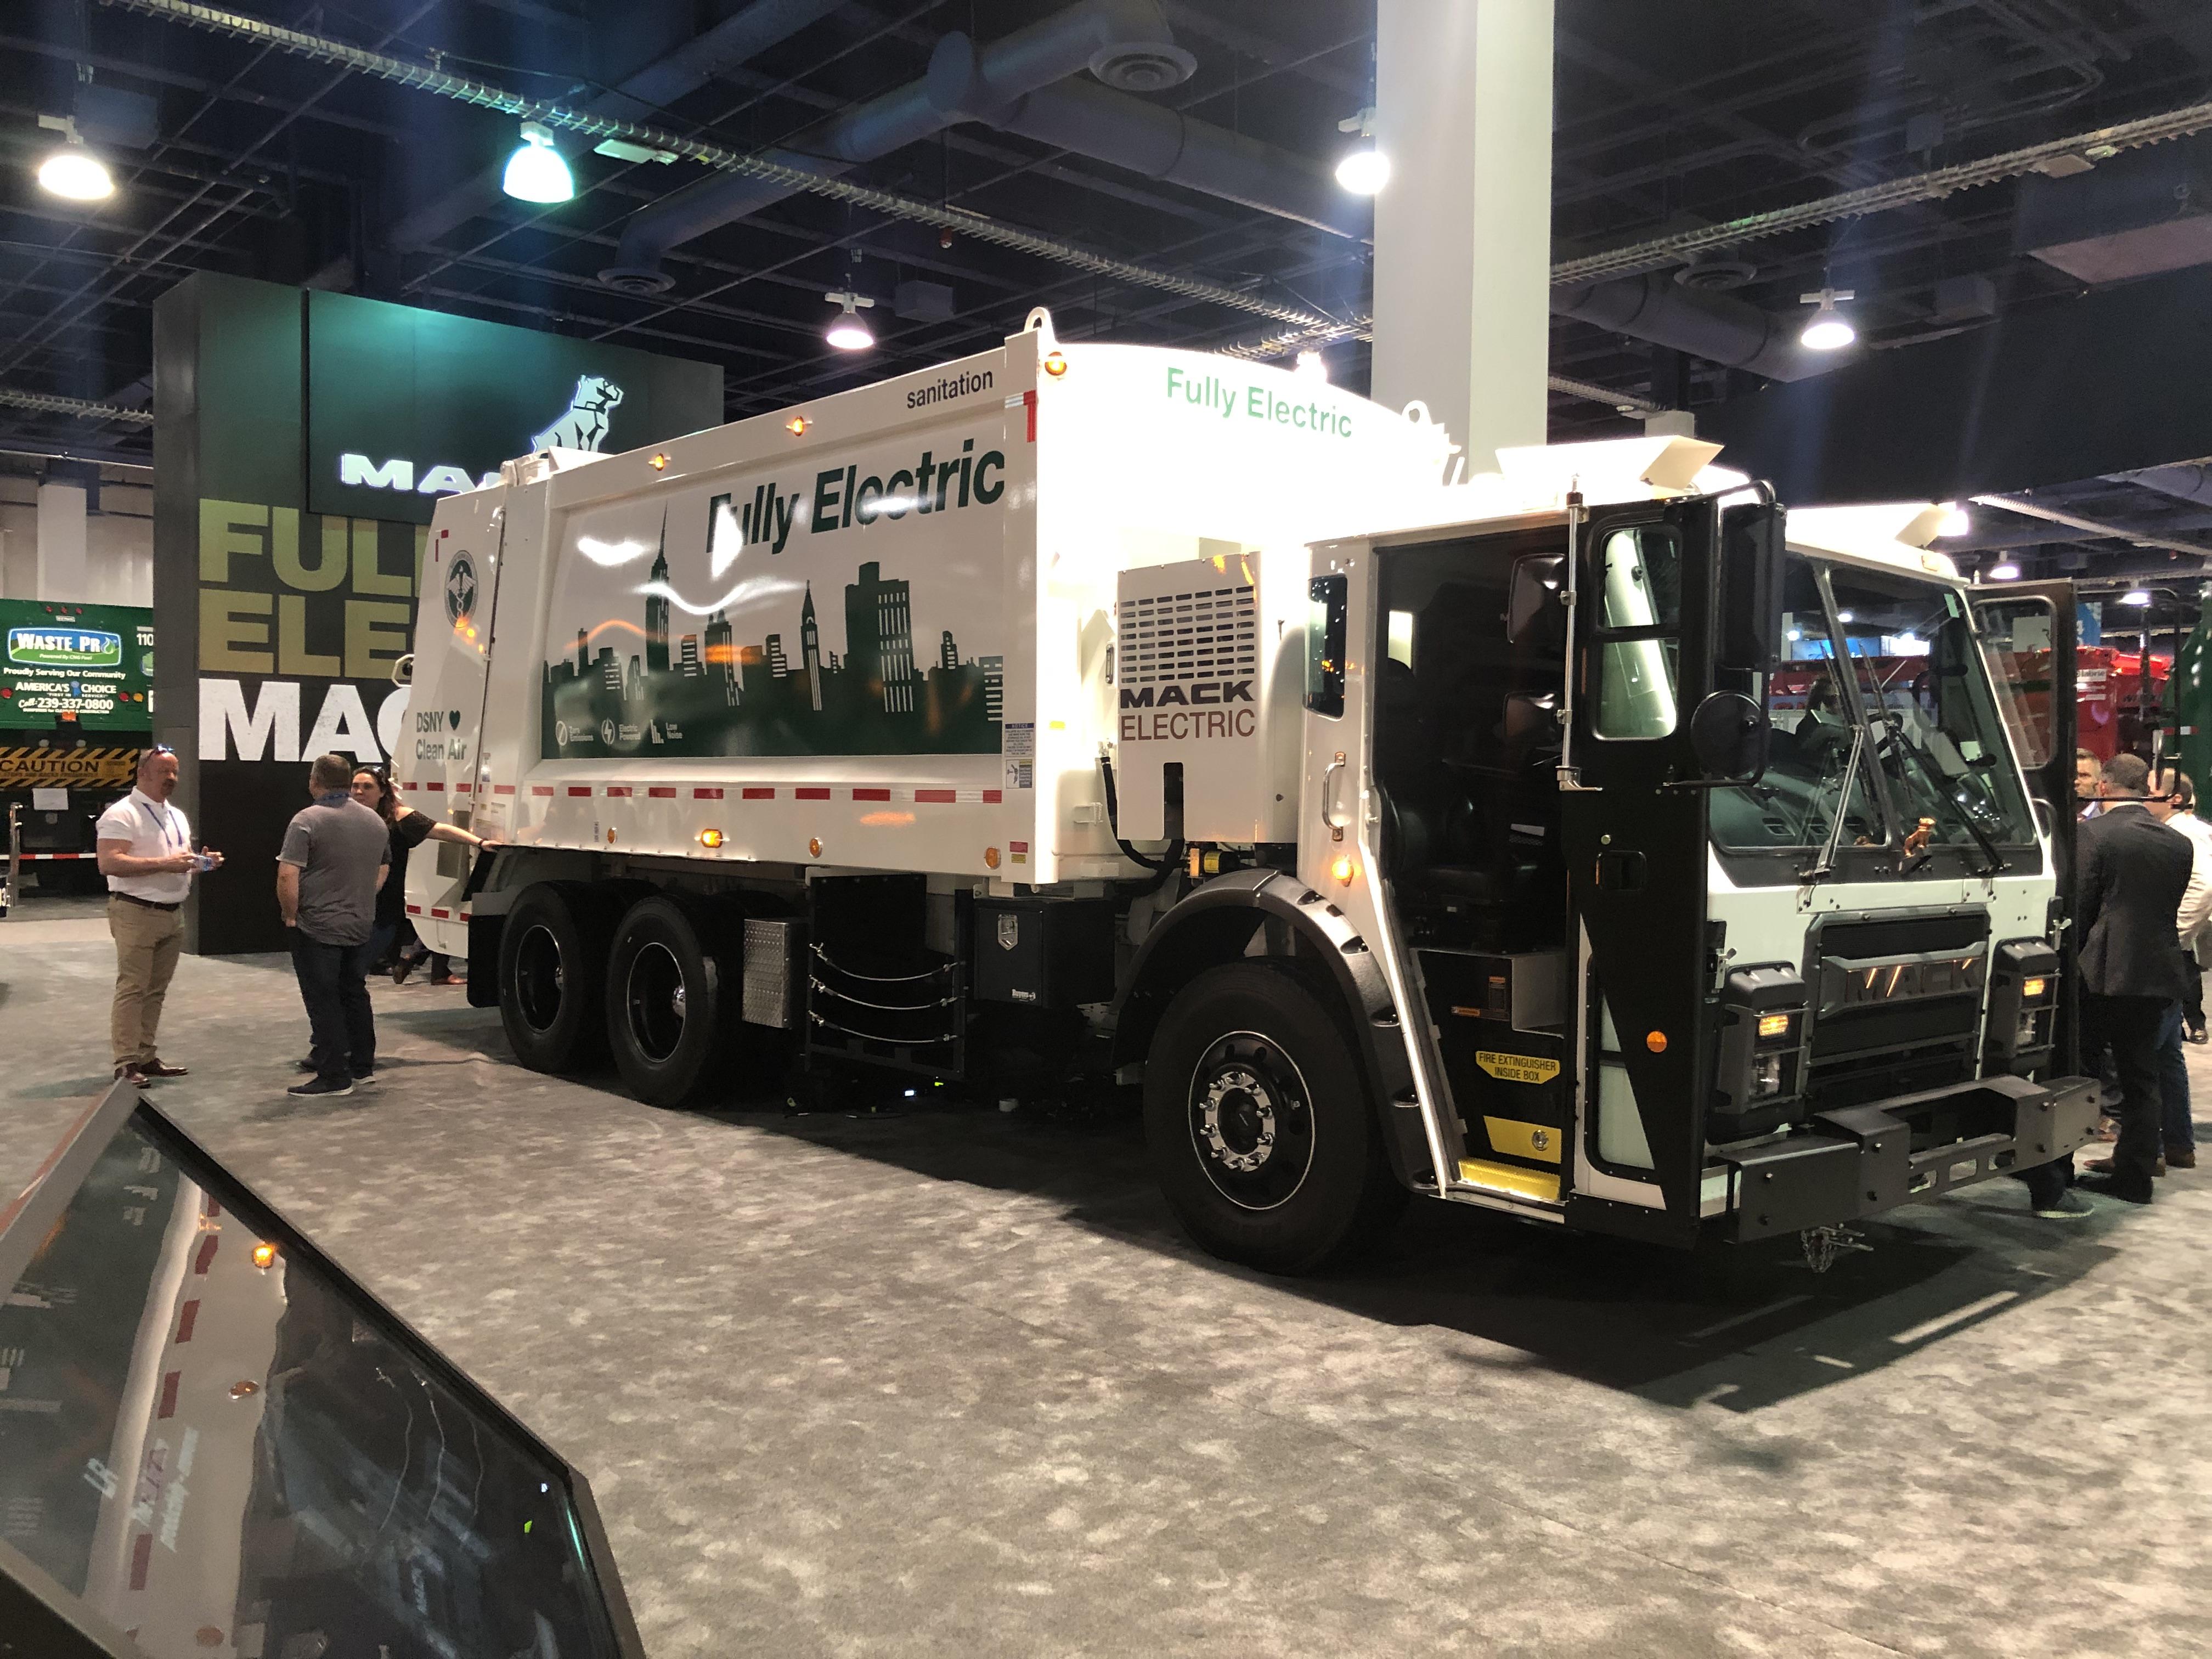 Mack Trucks has developed an Electric Rear Loader Trash Truck